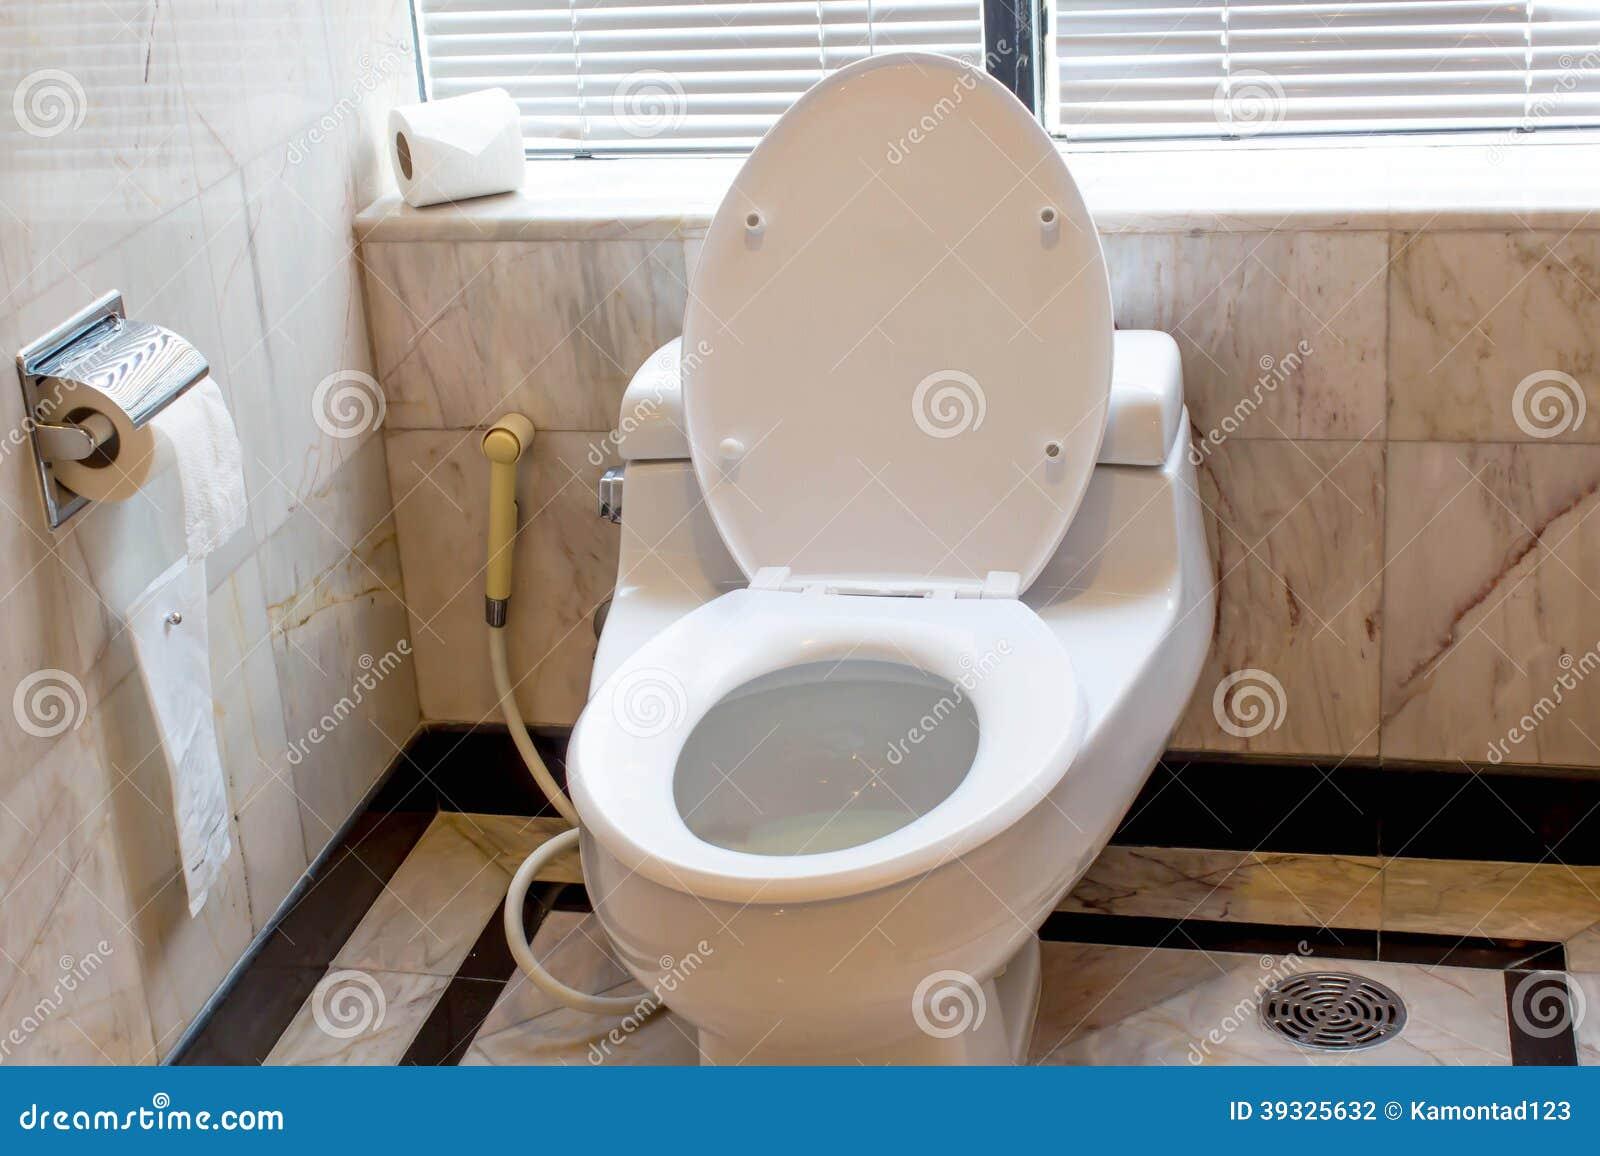 Home Flush Toilet Toilet Bowl Paper Stock Photo Image